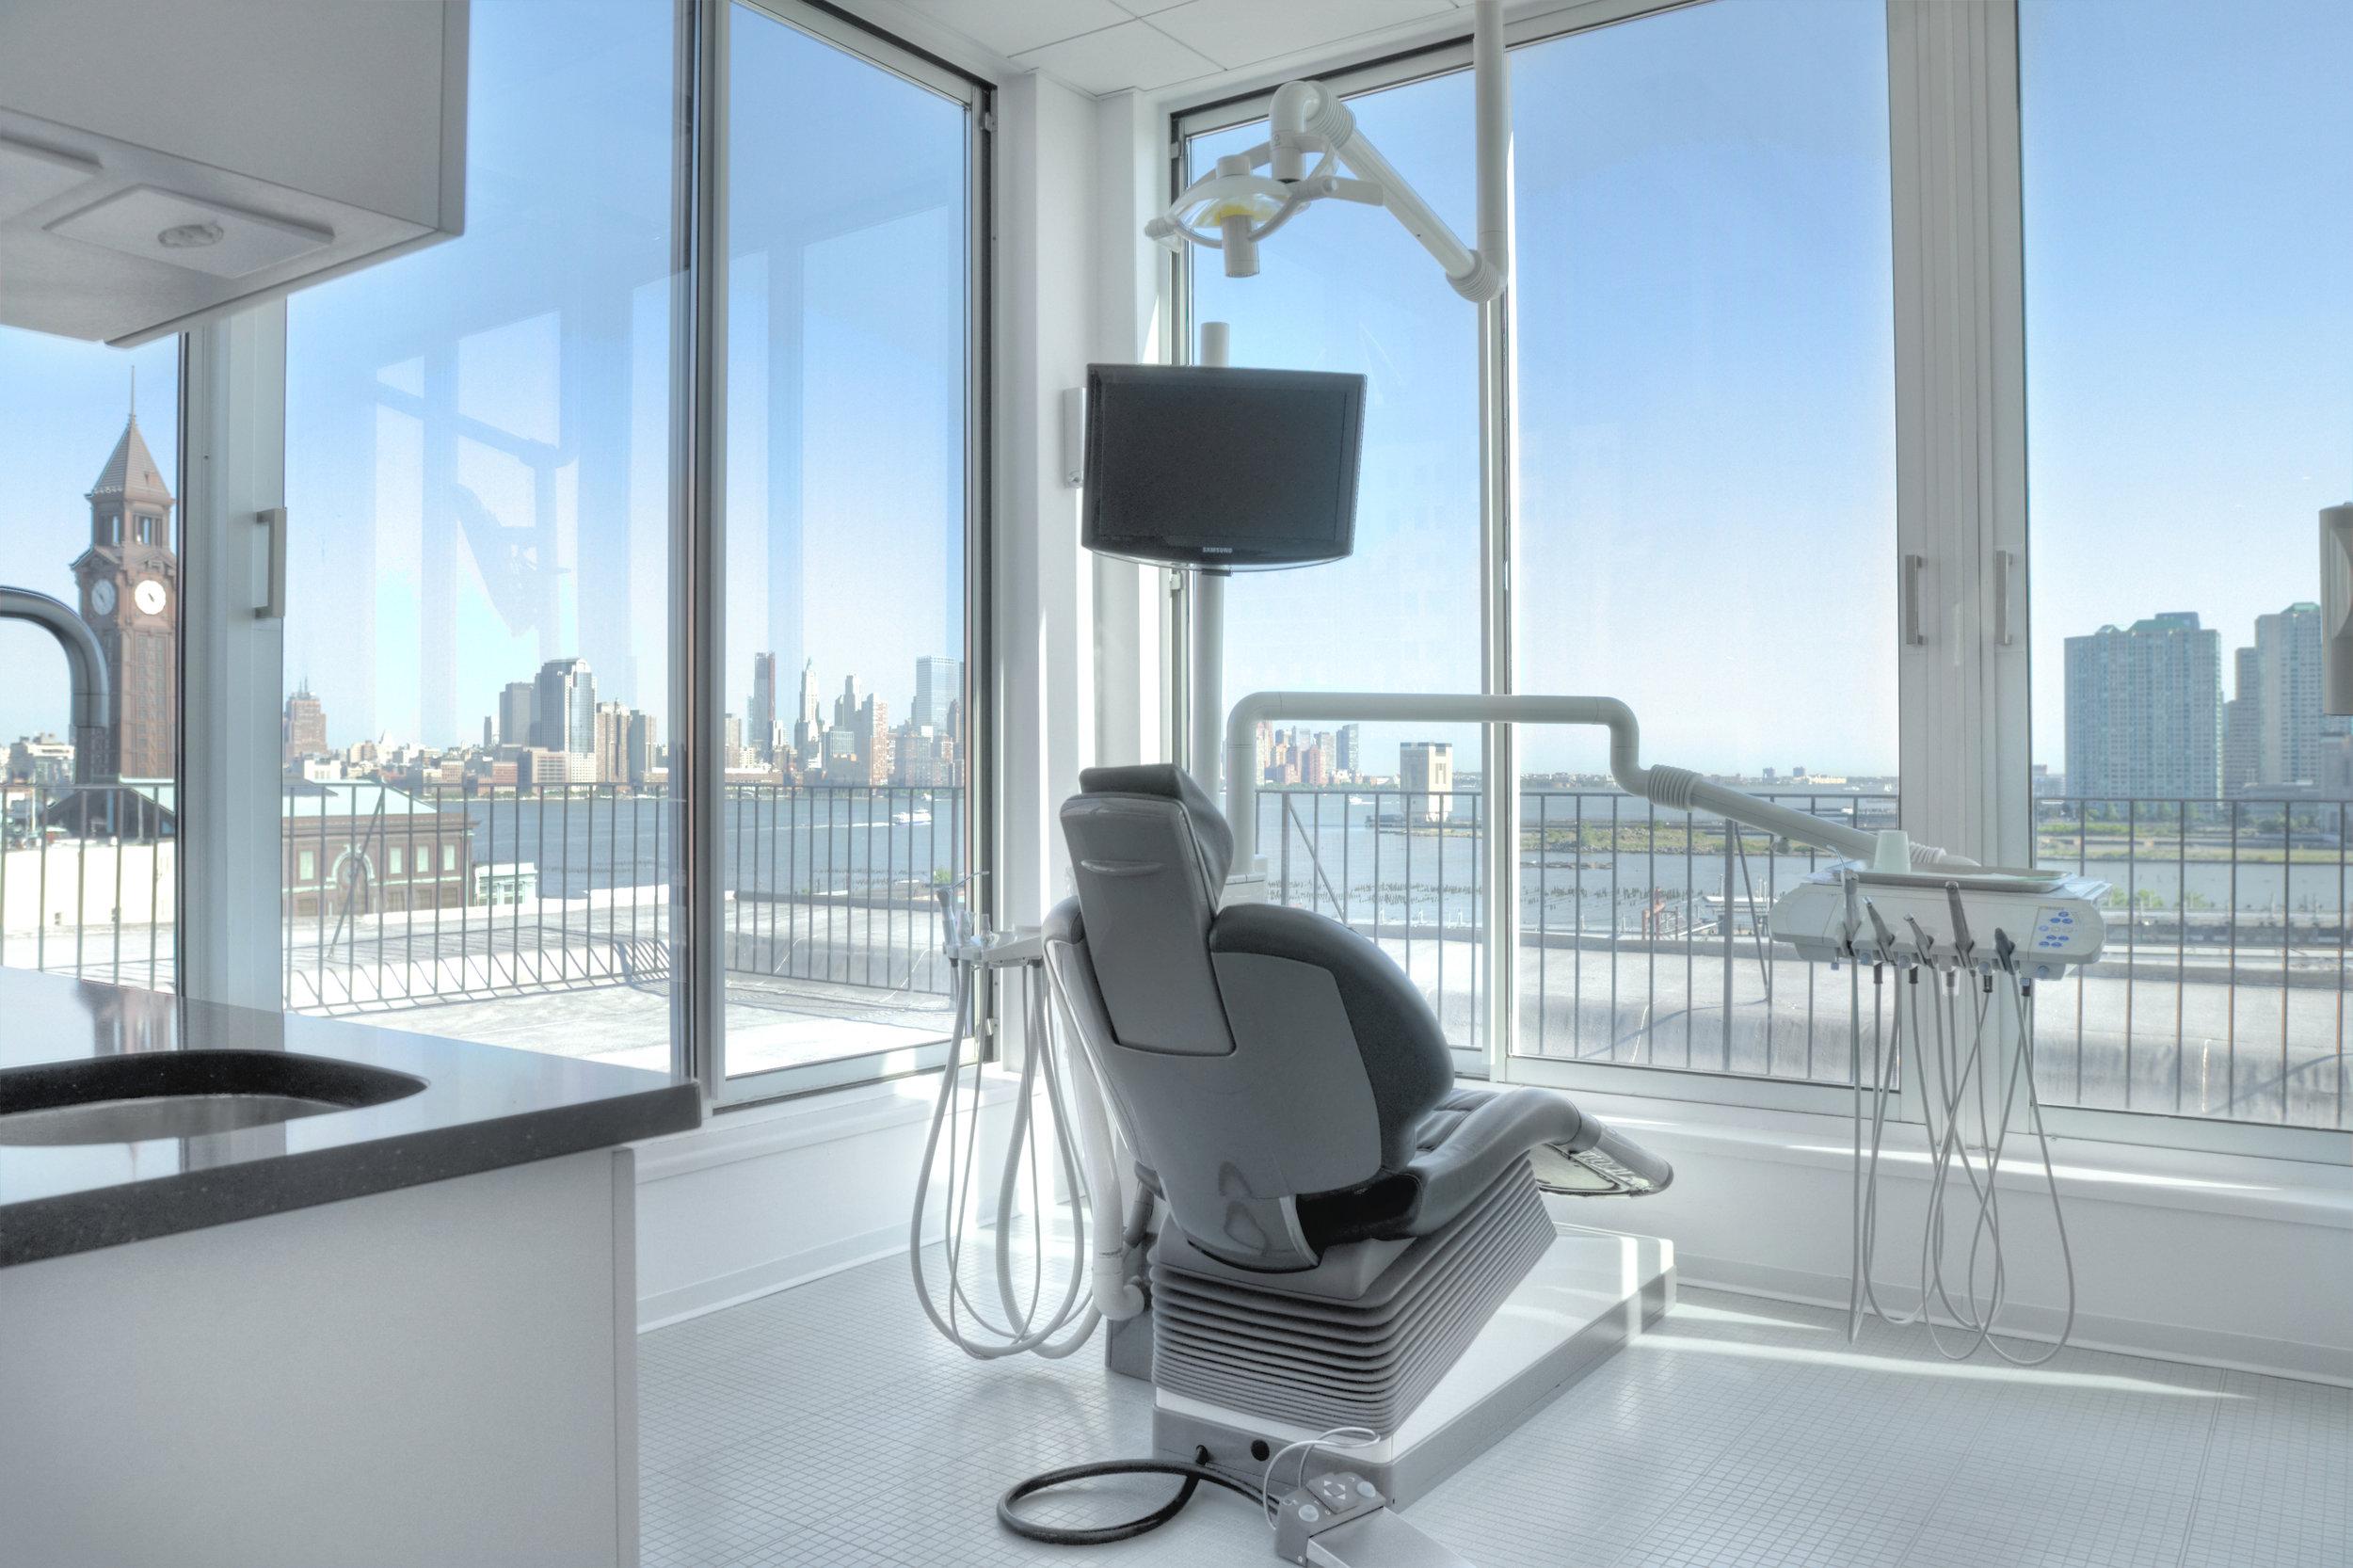 0019_Dentist 2 View.jpg